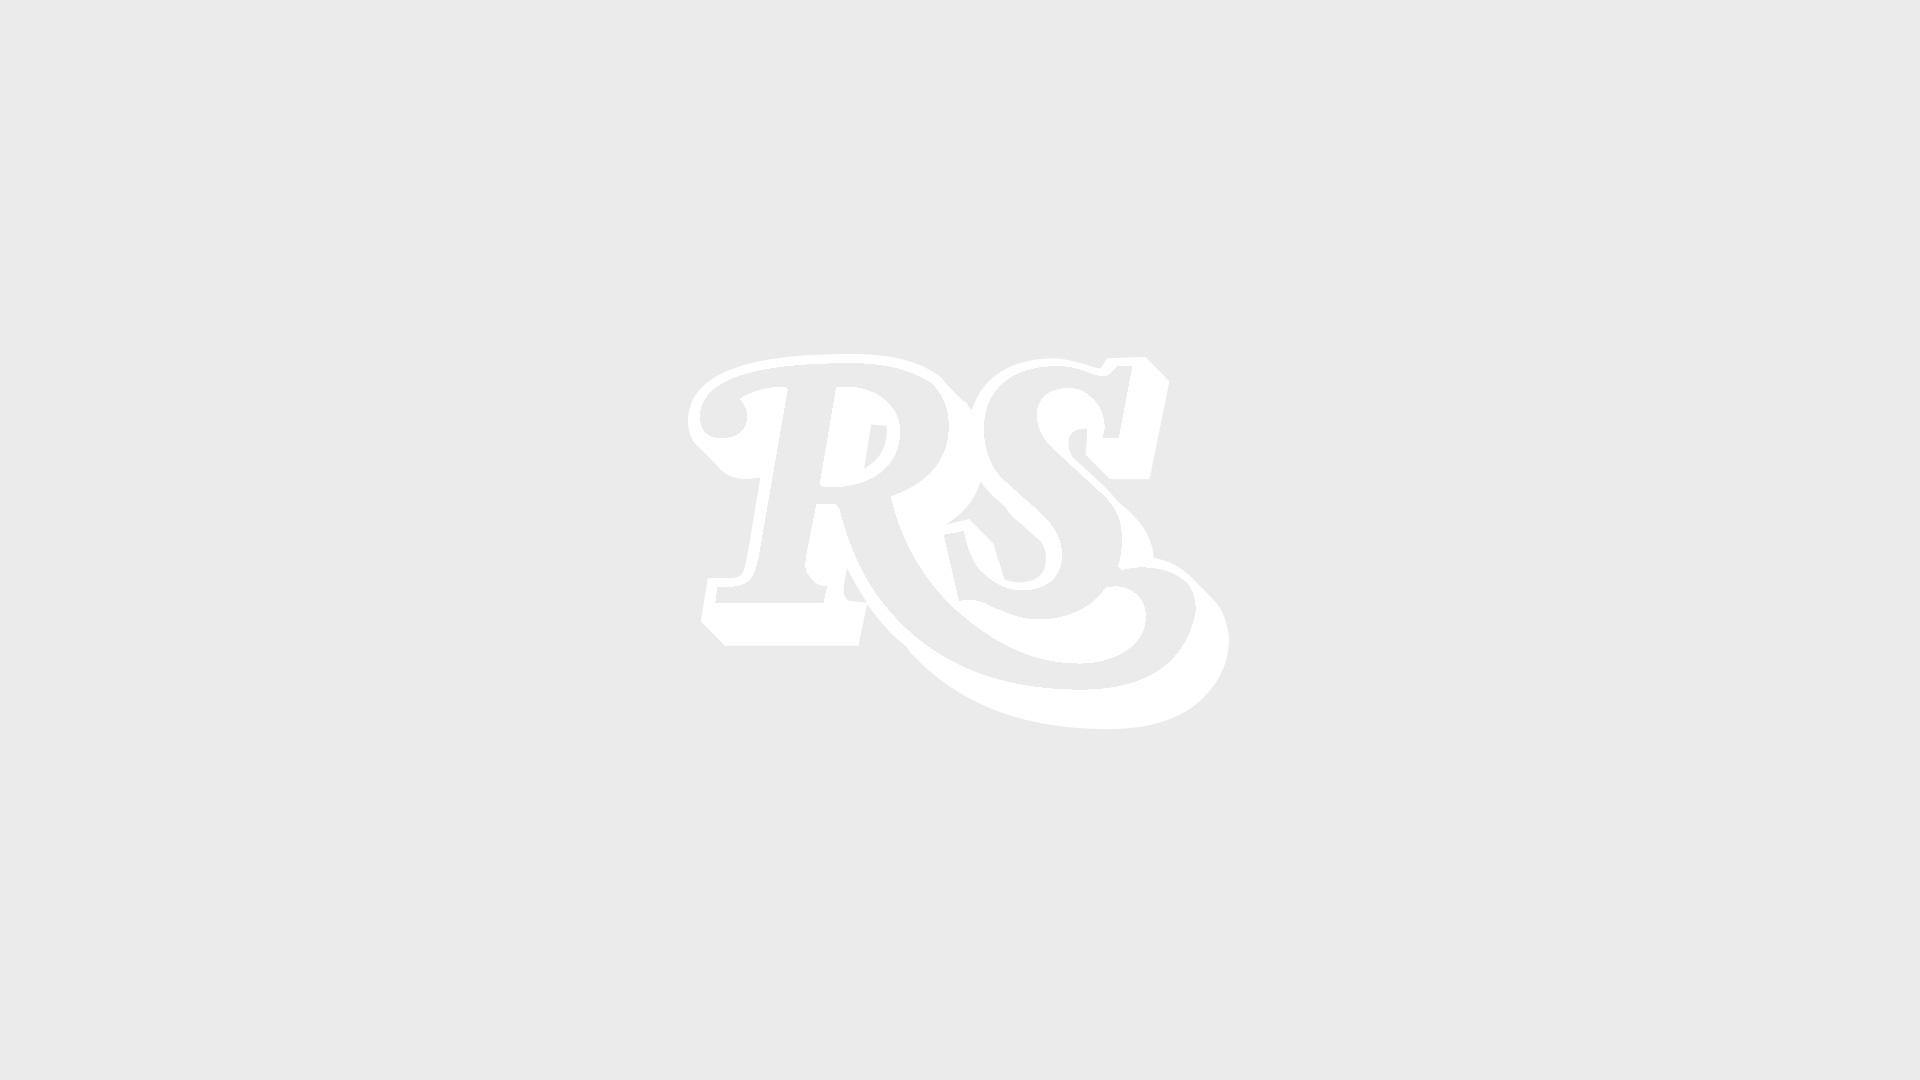 Ryan Adams covert komplett '1989' von Taylor Swift